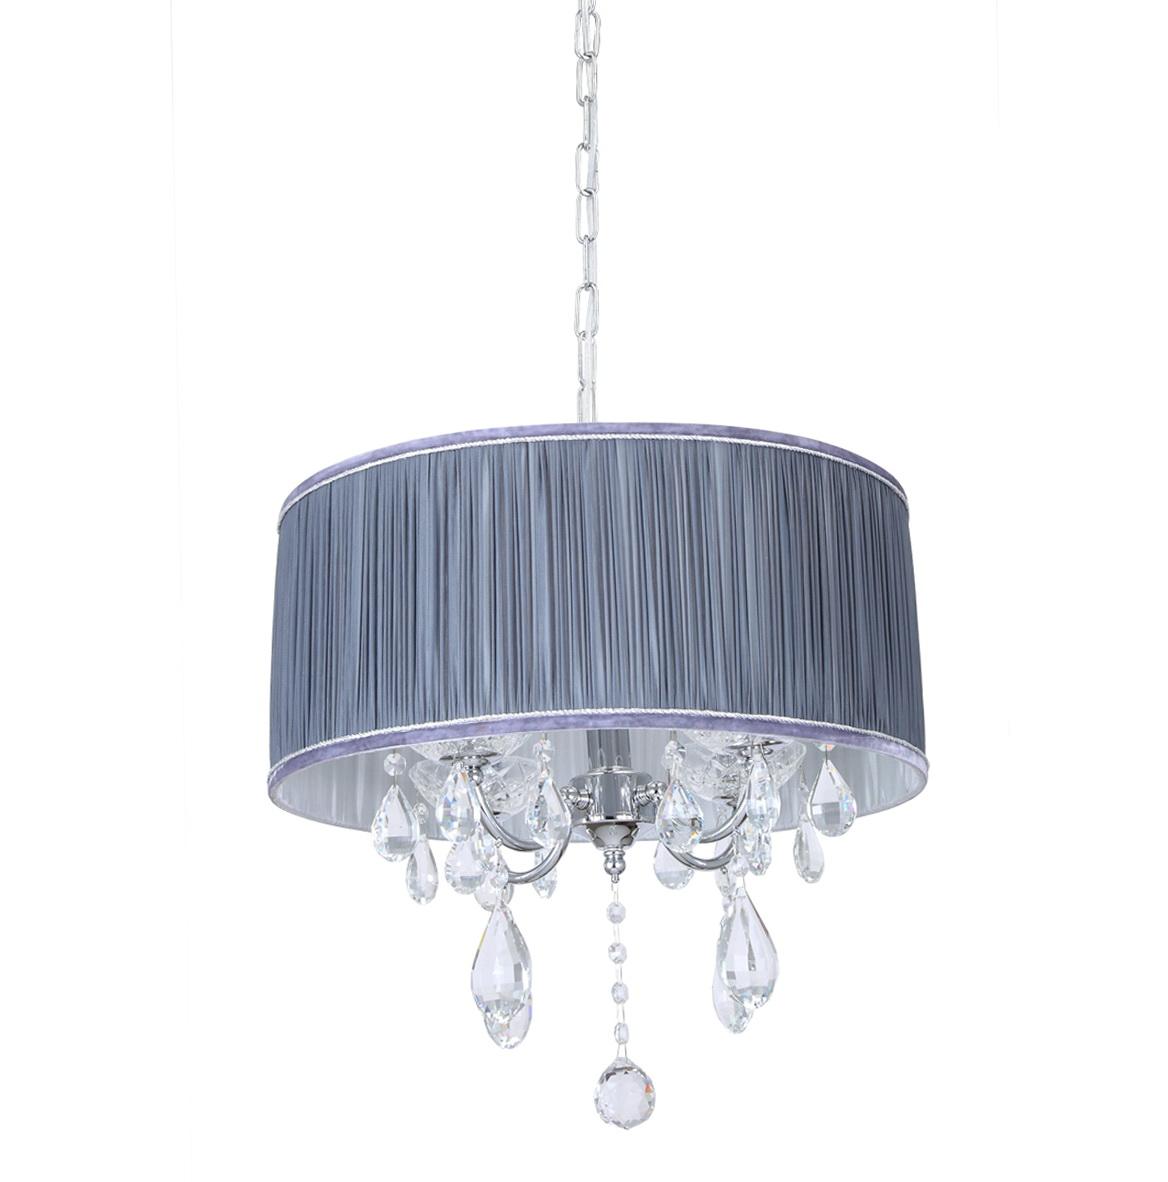 Chandelier Lamp Shades Uk